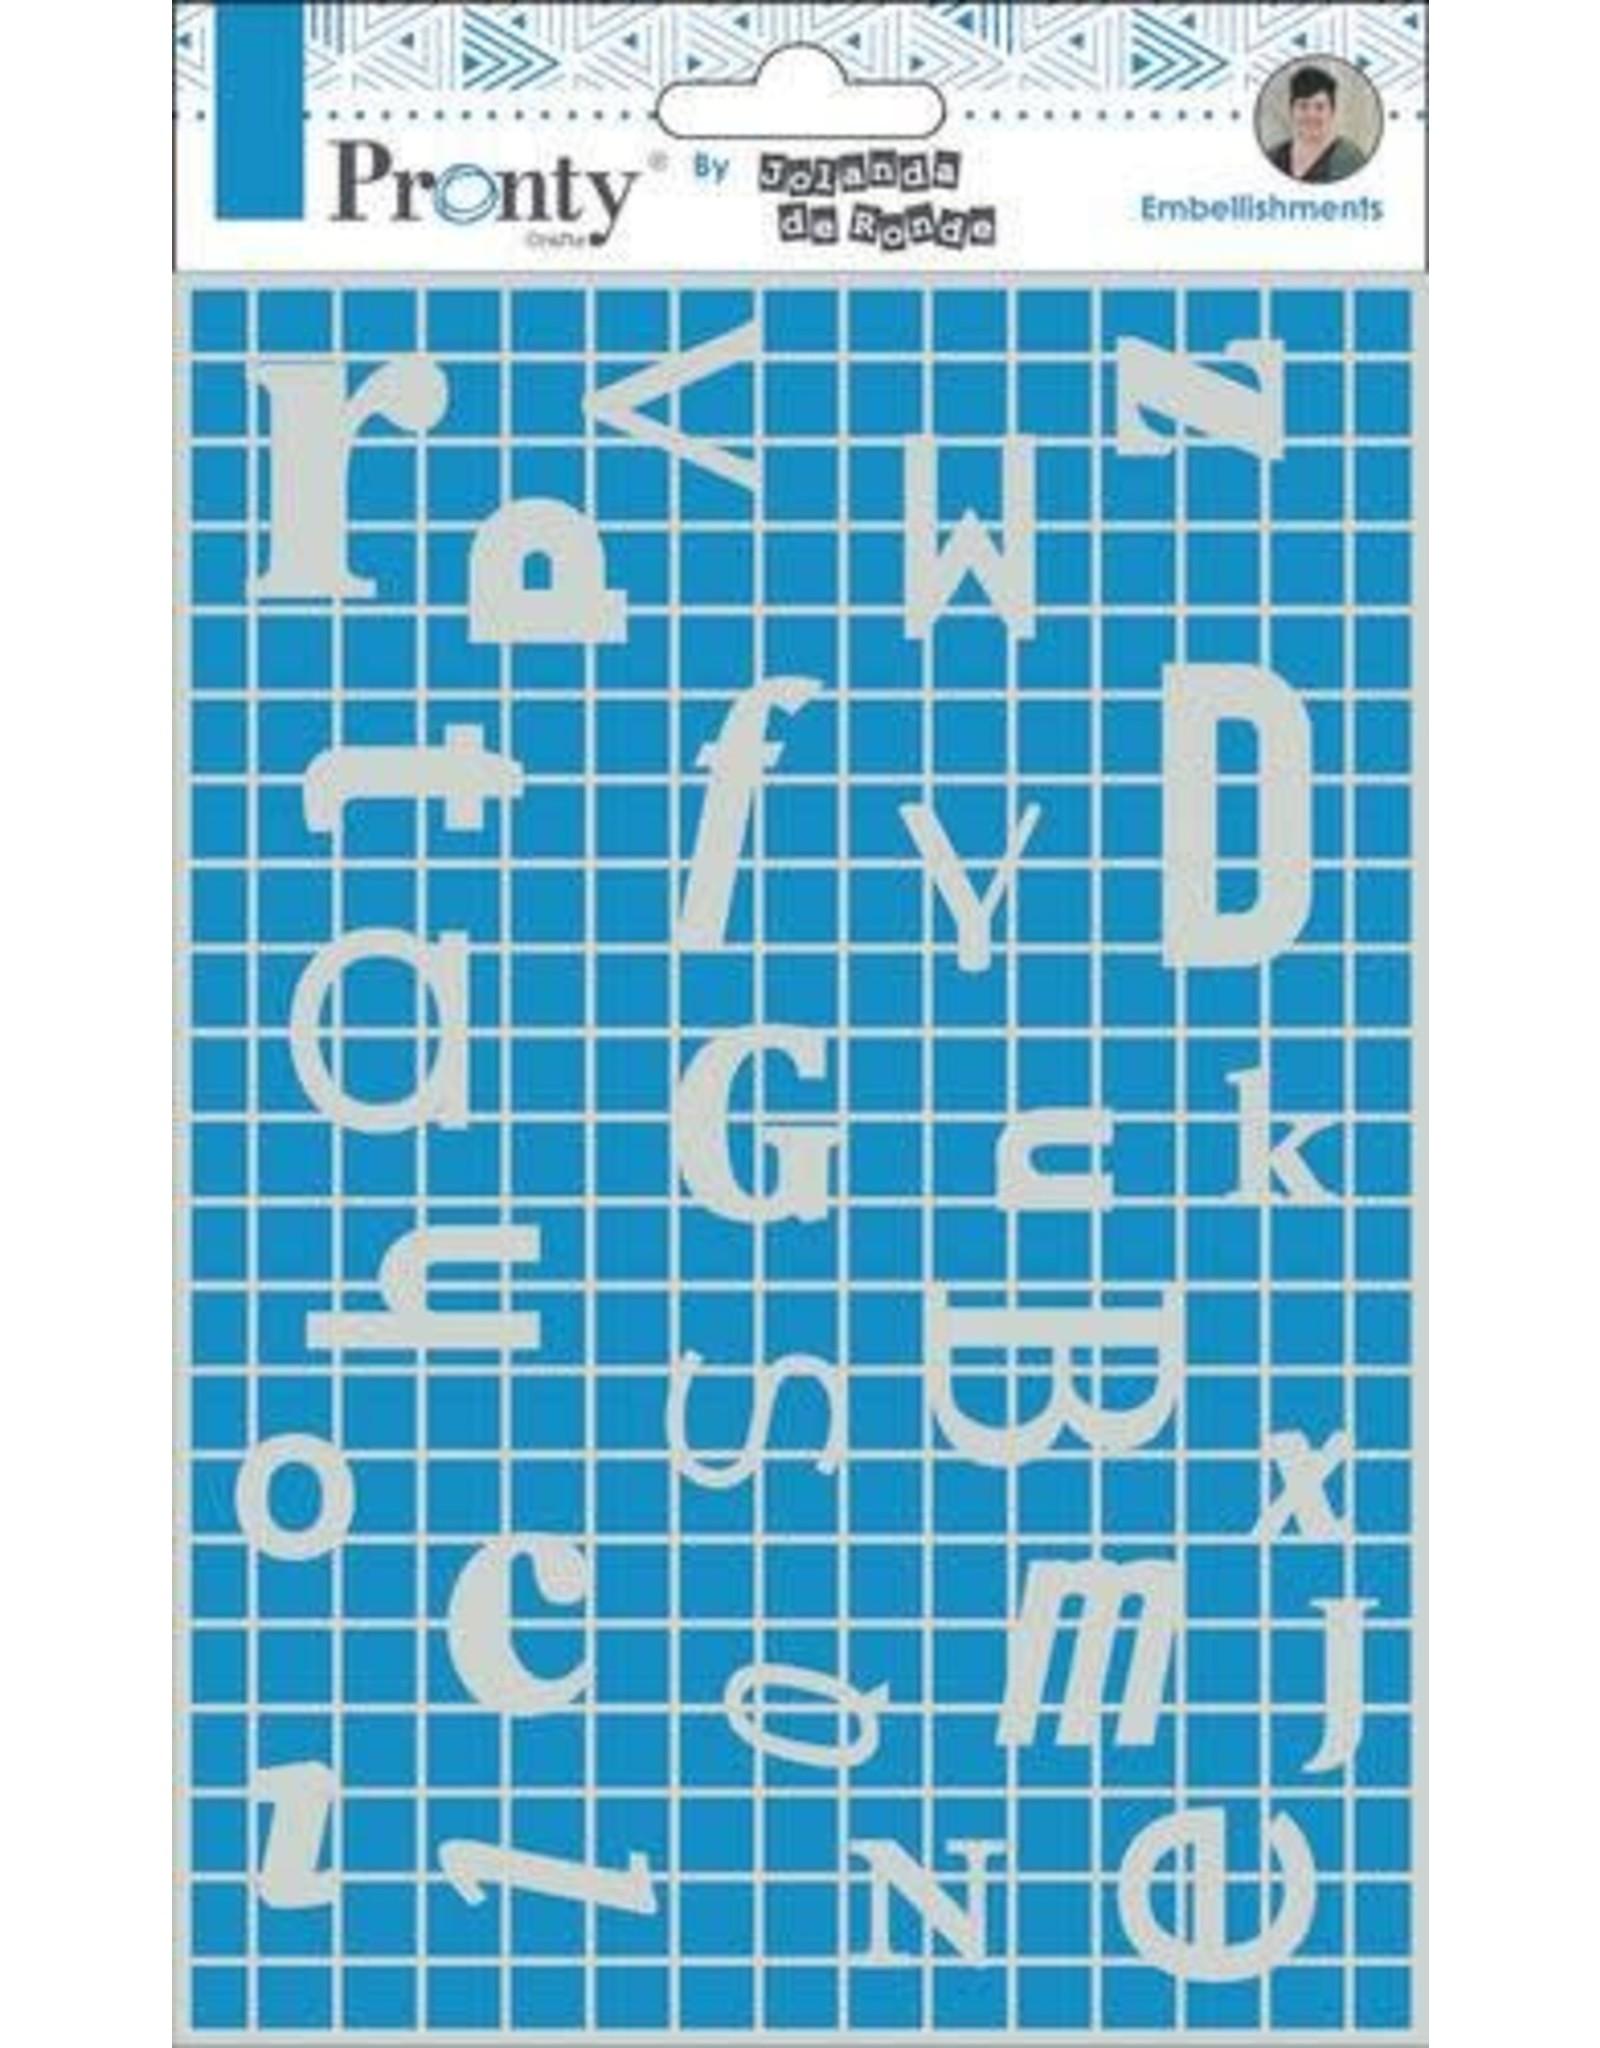 Pronty Pronty Chipboard Letters Frame A5 492.010.009 by Jolanda